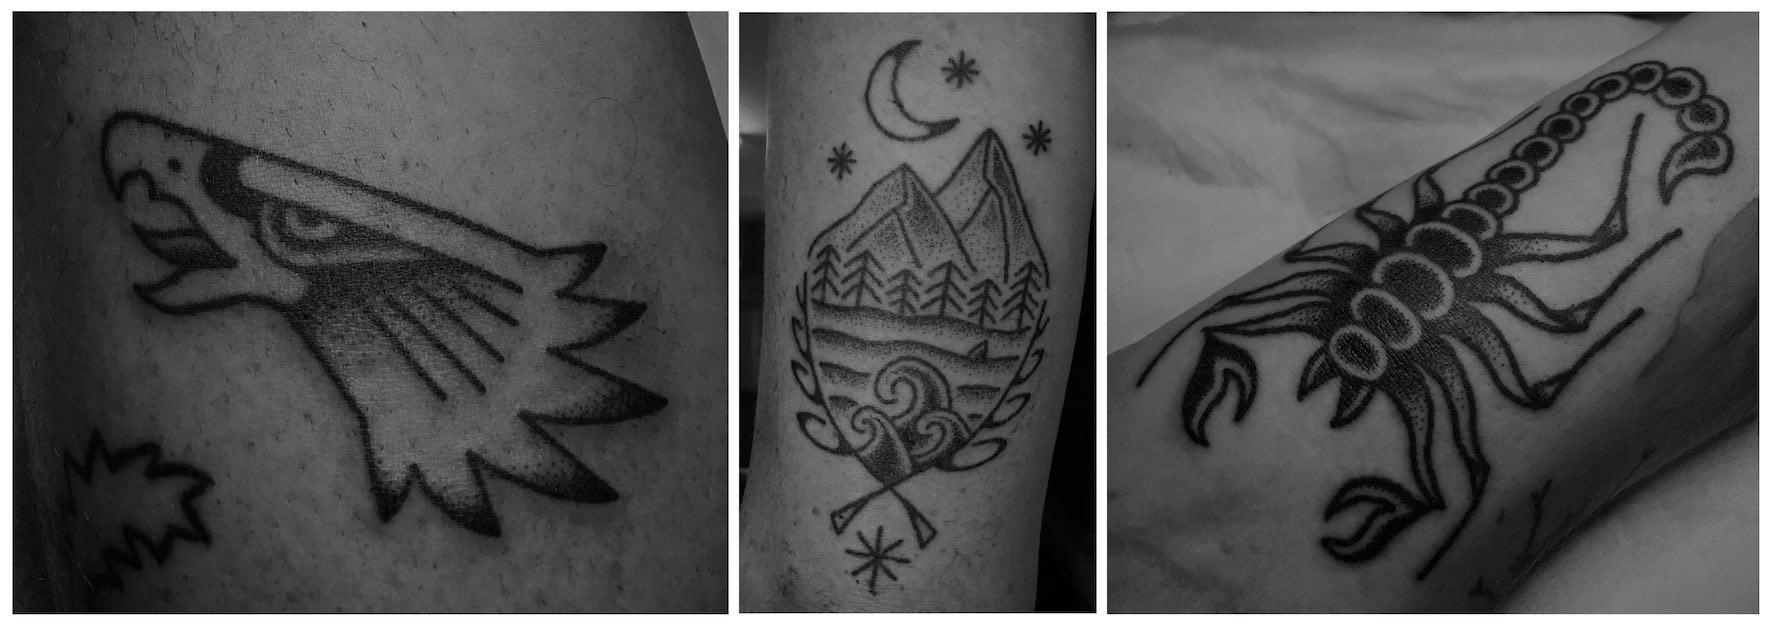 A selection of Hand Poke tattoos done by Tarzan